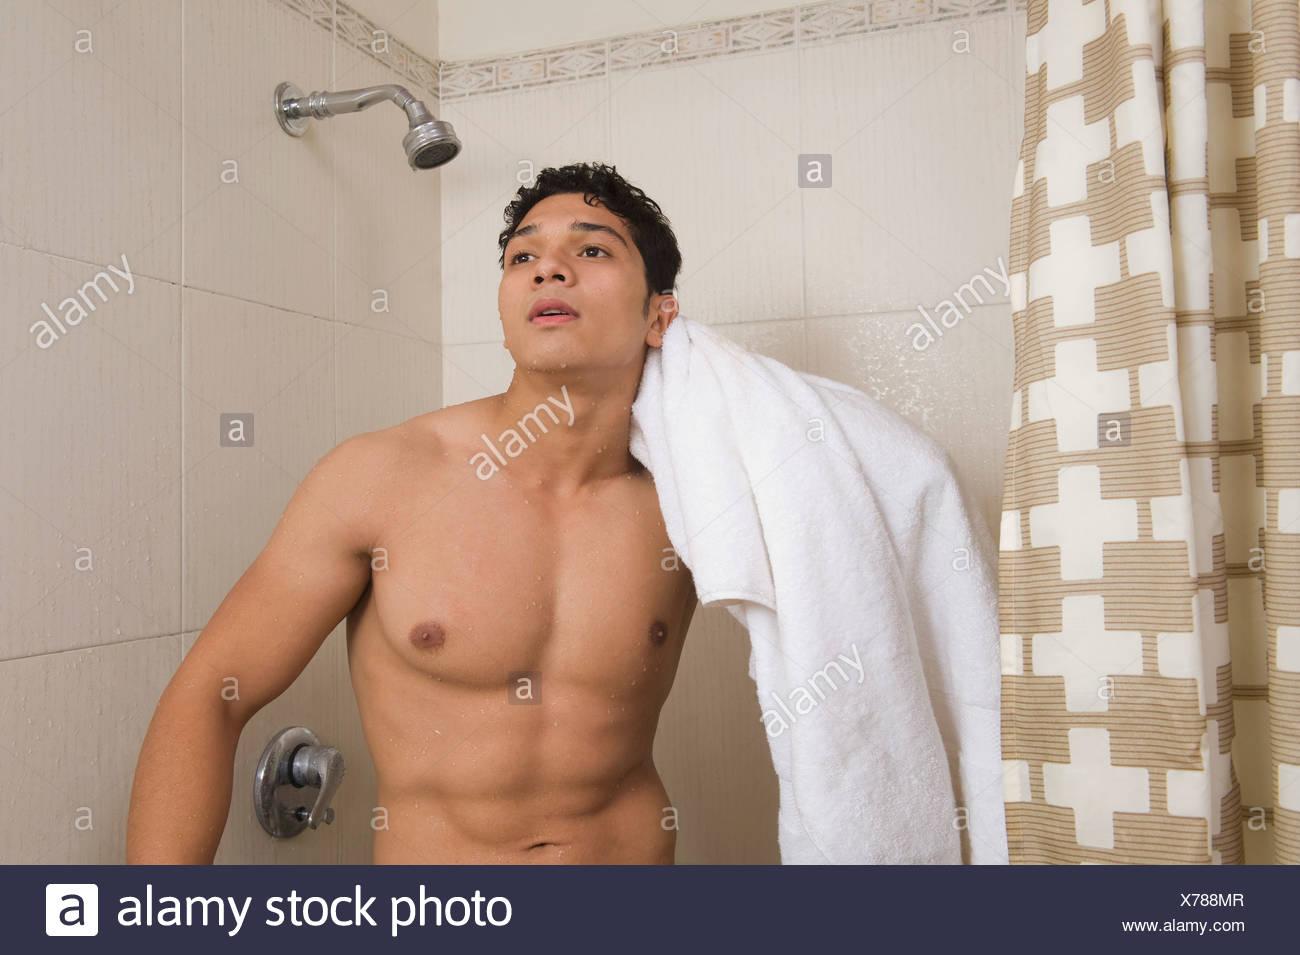 Man Shower Bath Towel Stock Photos & Man Shower Bath Towel Stock ...